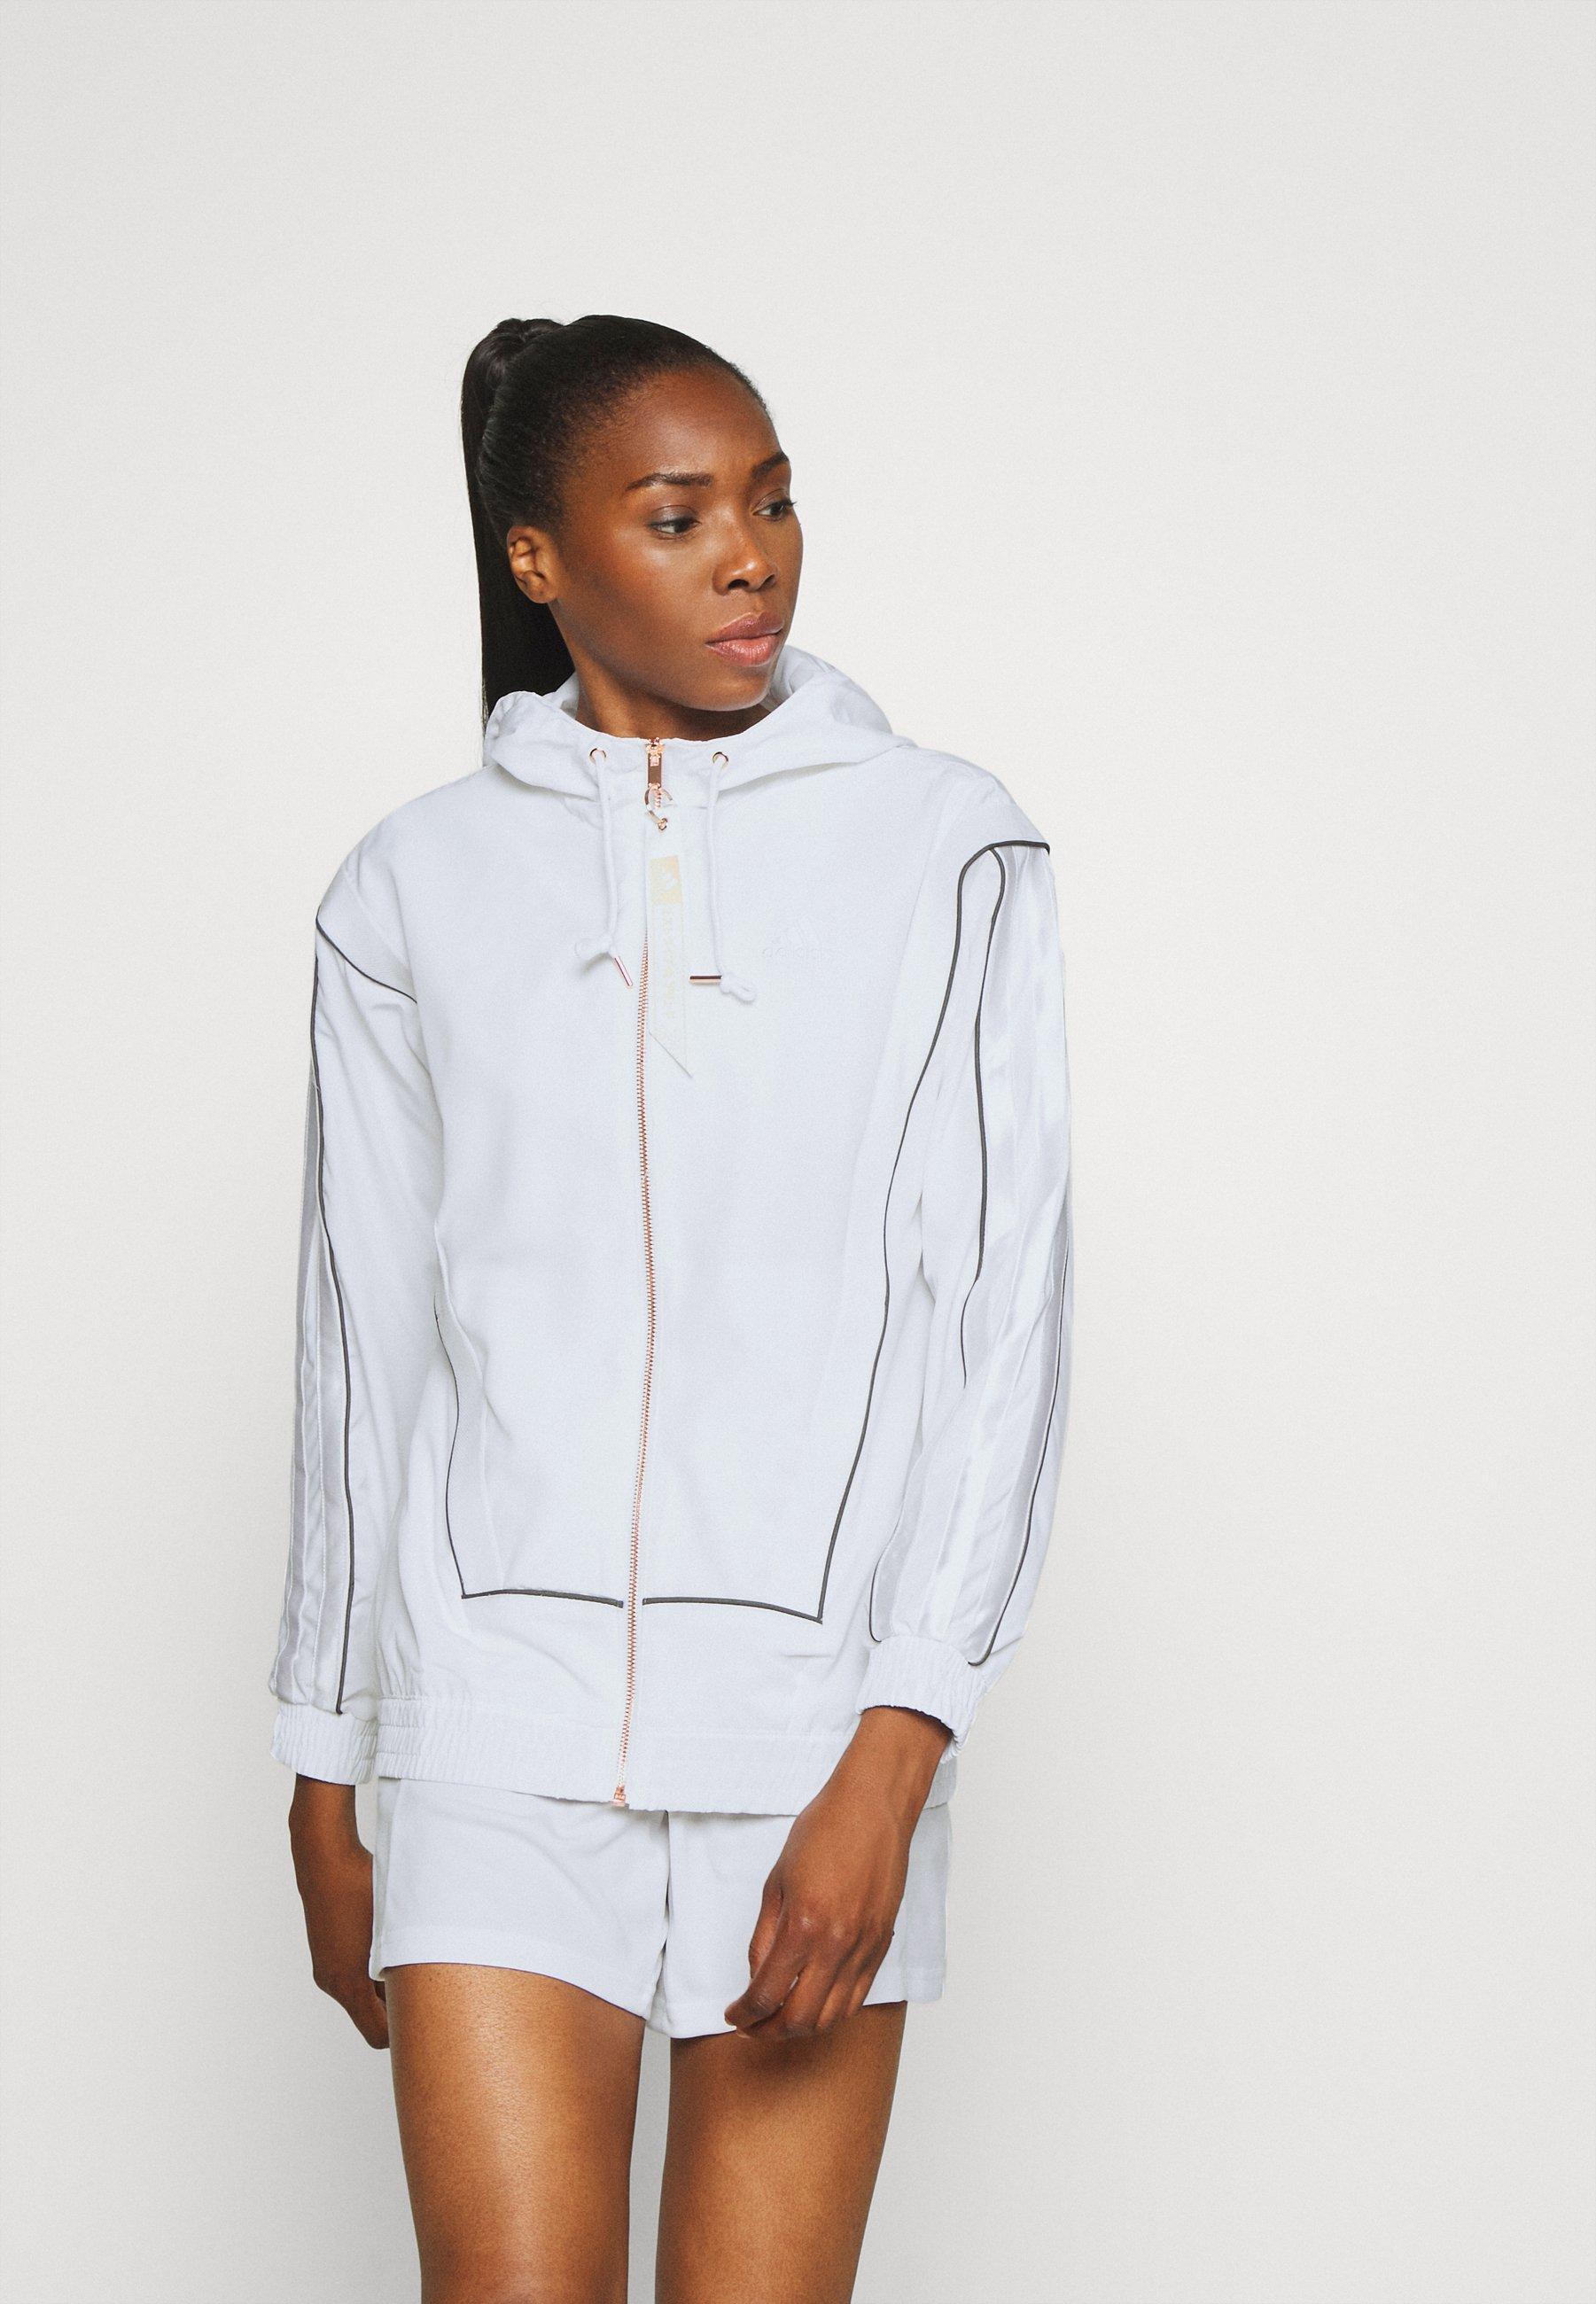 Factory Outlet Women's Clothing adidas Performance AEROREADY PRIMEGREEN SPORTS BASKETBALL JACKET Training jacket white uNEWs20OS